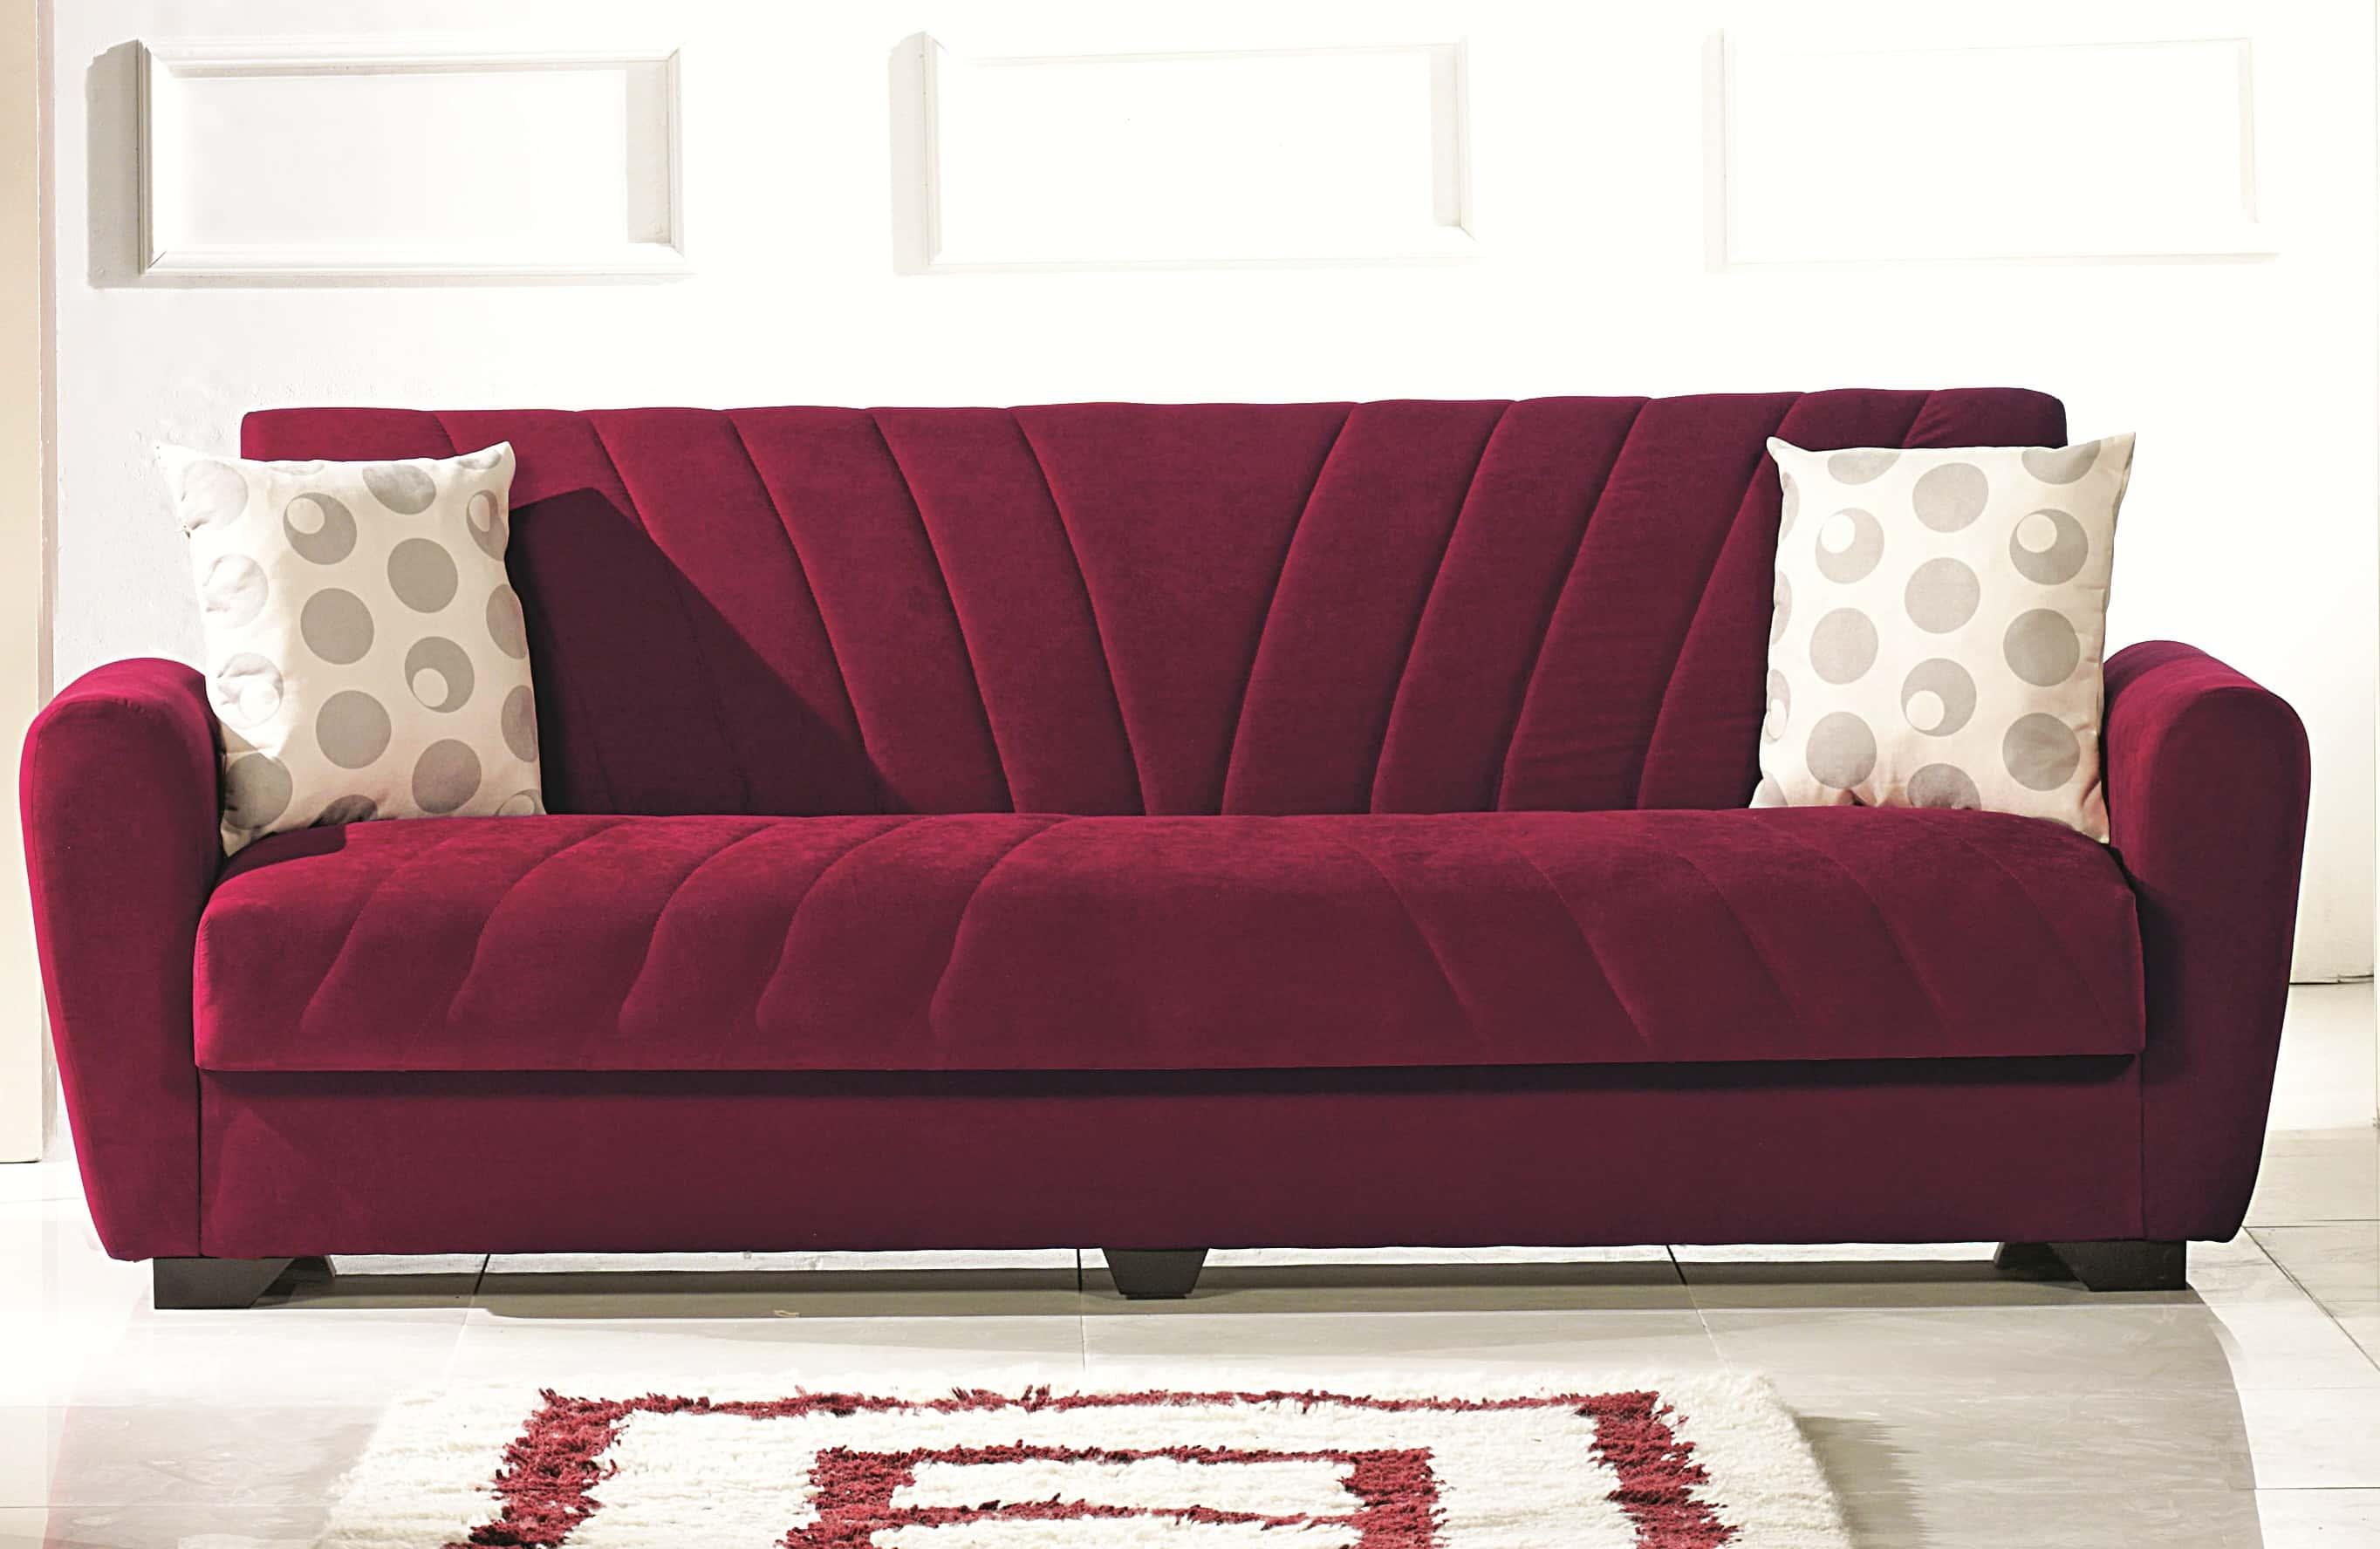 ikea sofas usa Sofa Hpricot